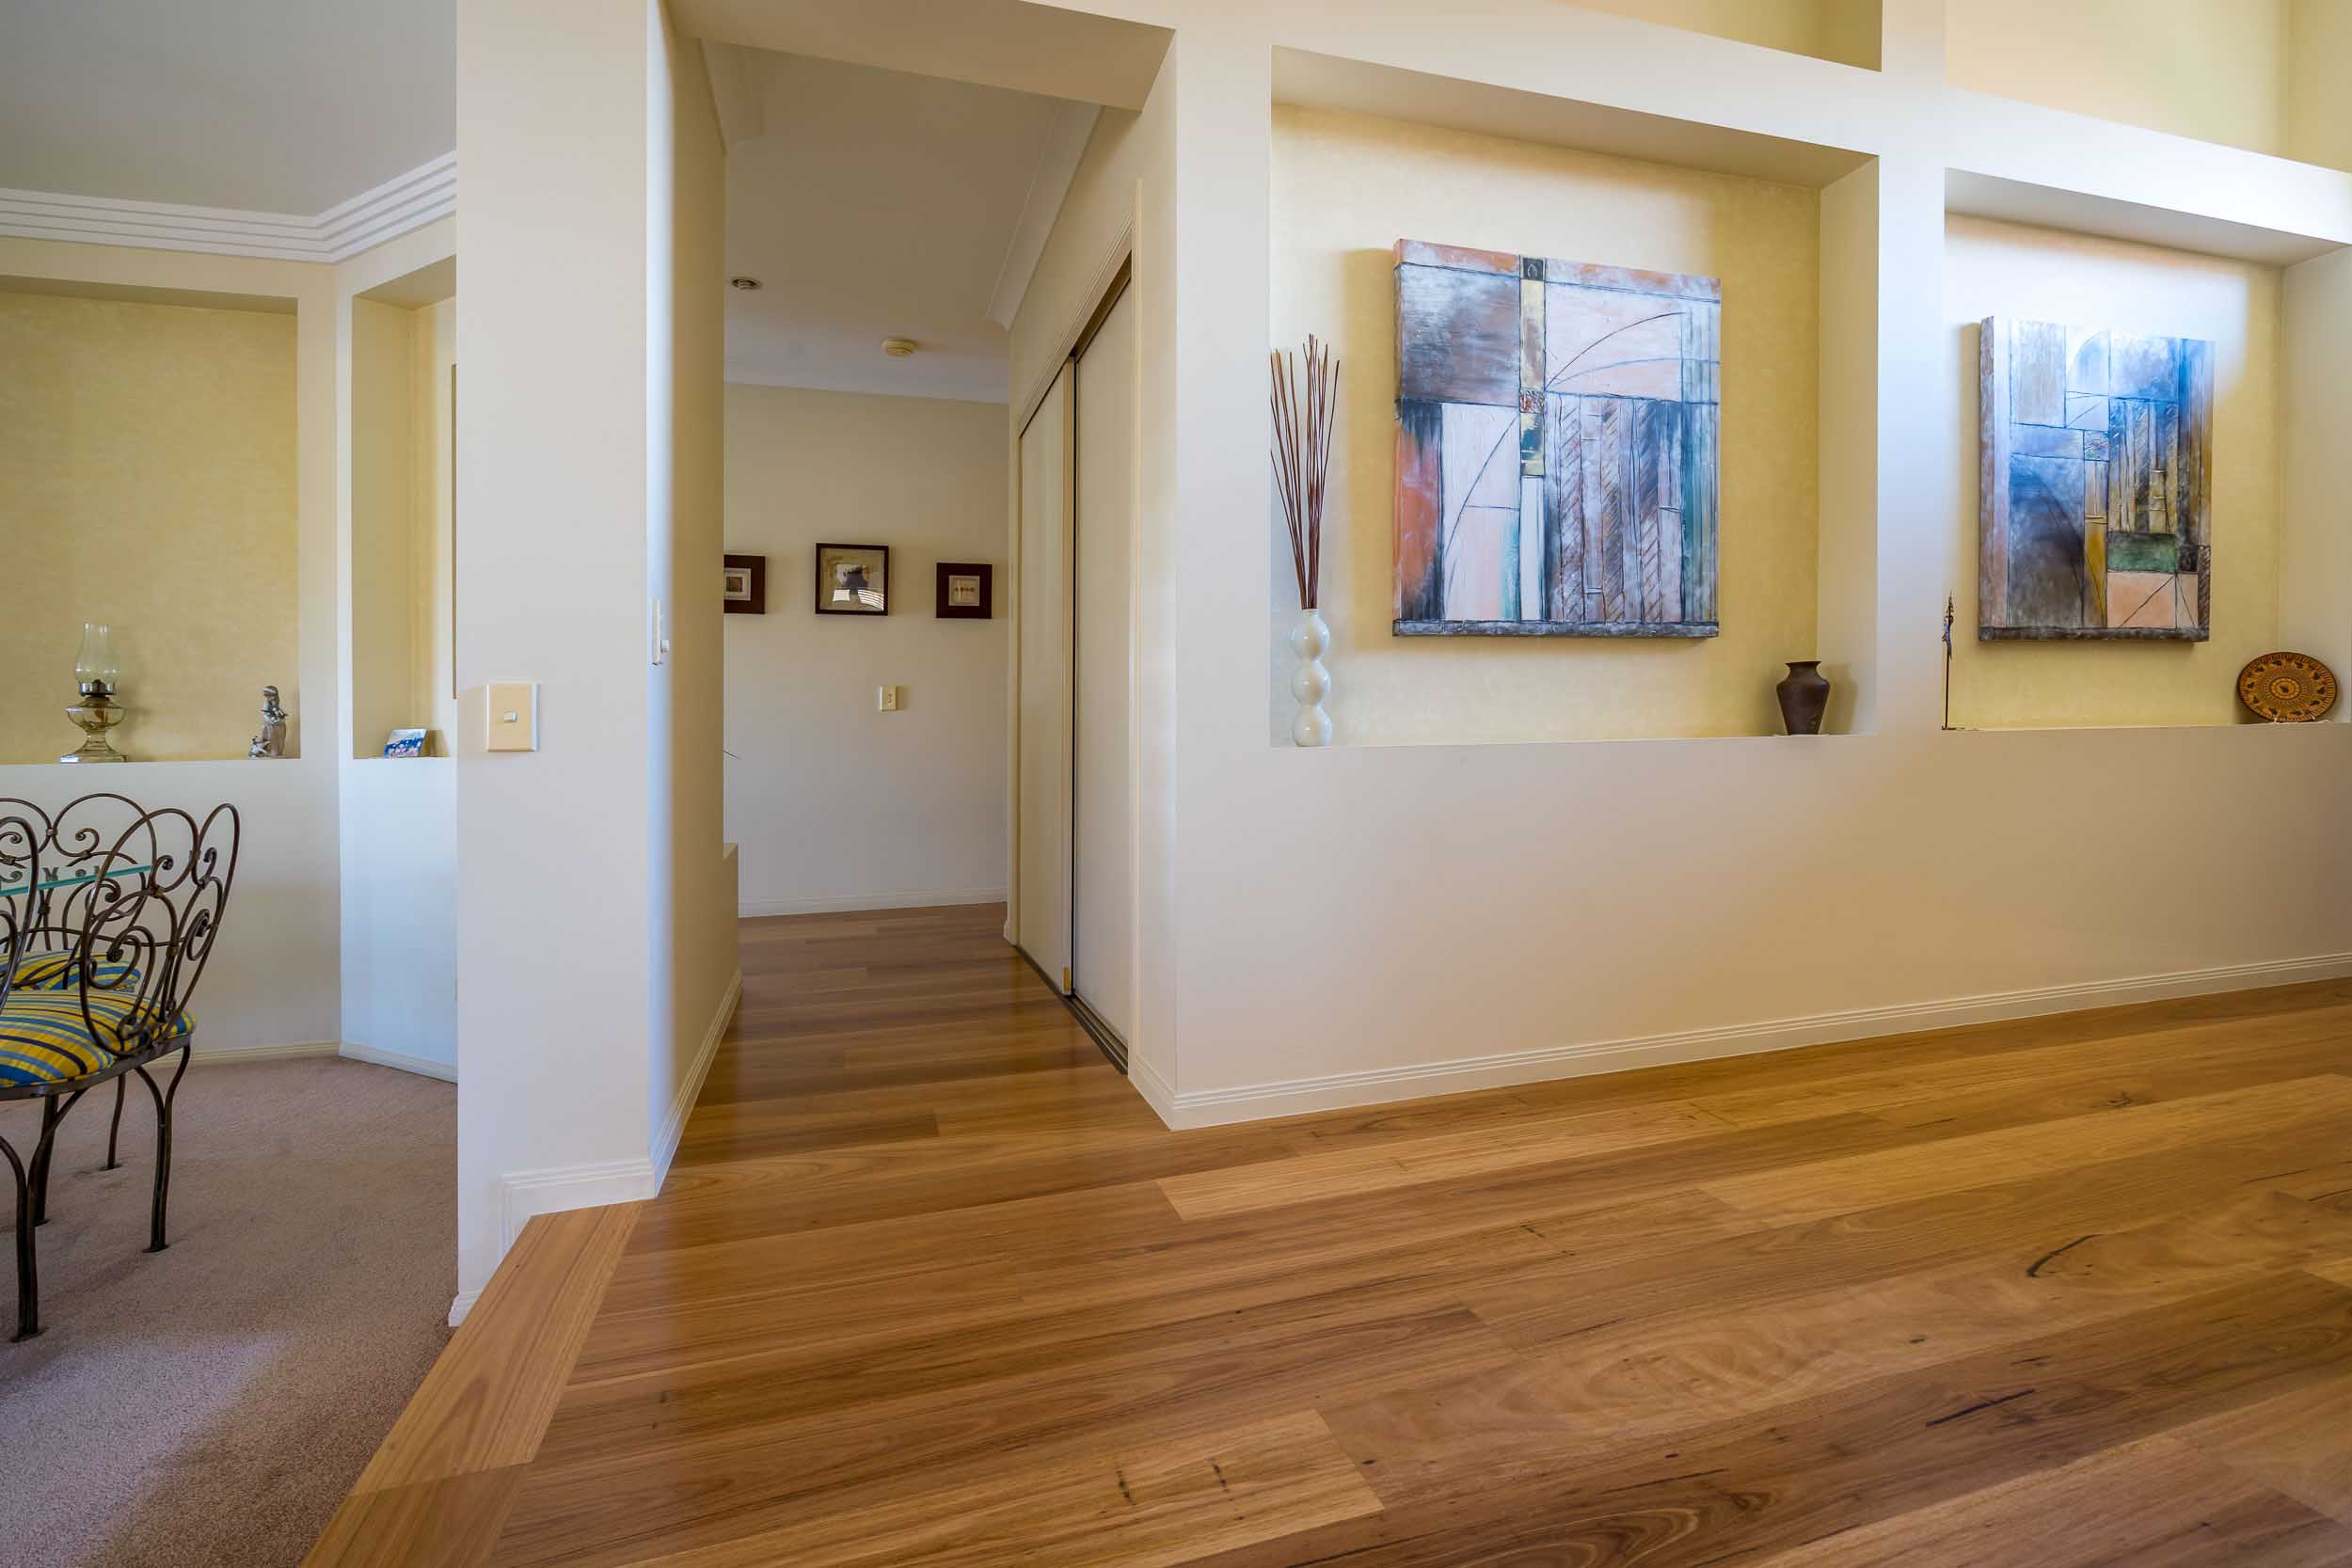 Gallery_007